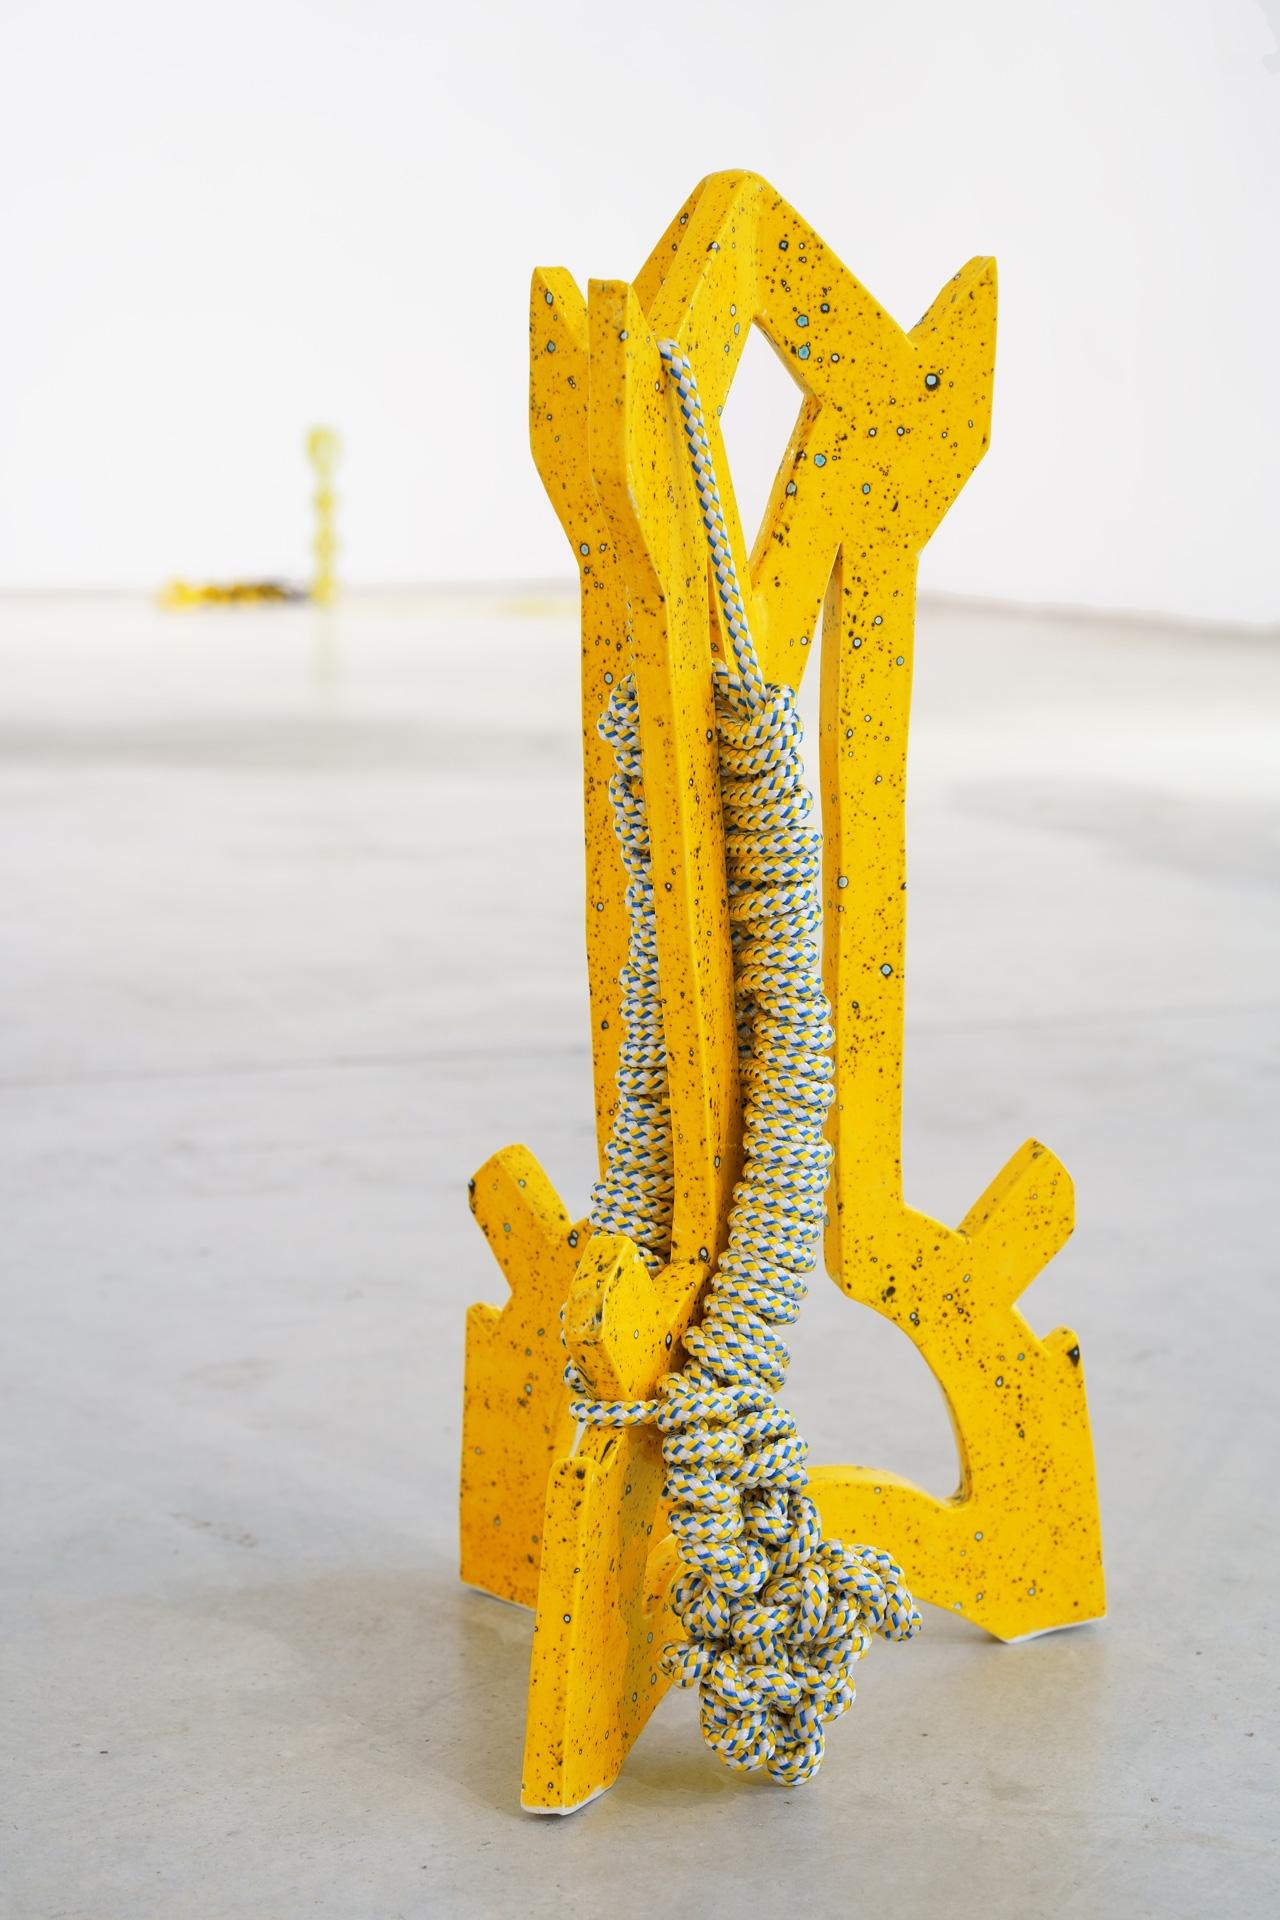 Timo Nasseri, Yellow Big, 2019, Glazed ceramics and rope, 62 x 27 x 33 cm